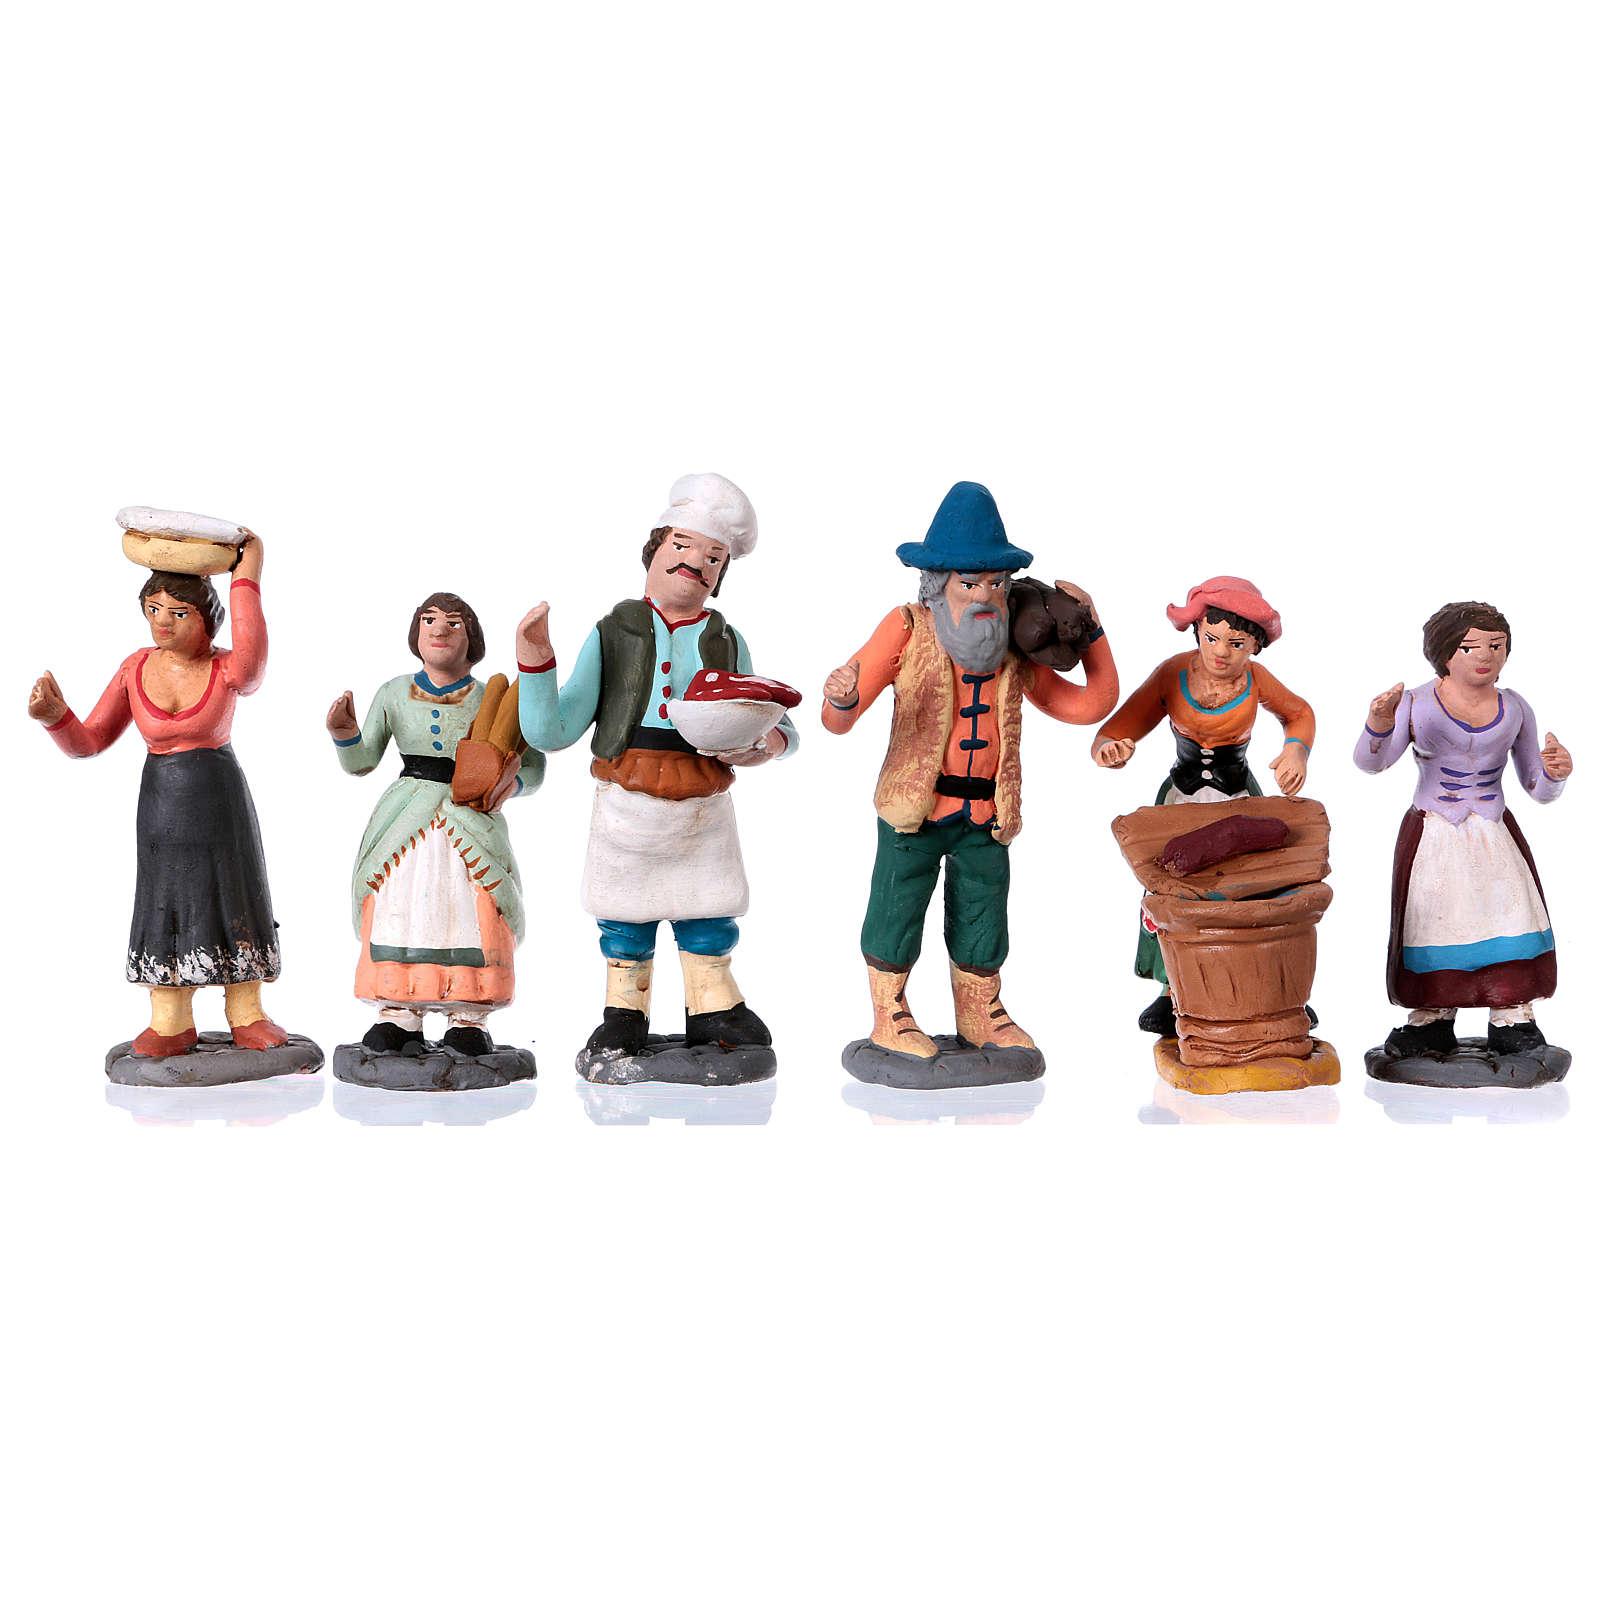 Neapolitan Nativity Scene 10 cm terracotta figurines, set of 36 4